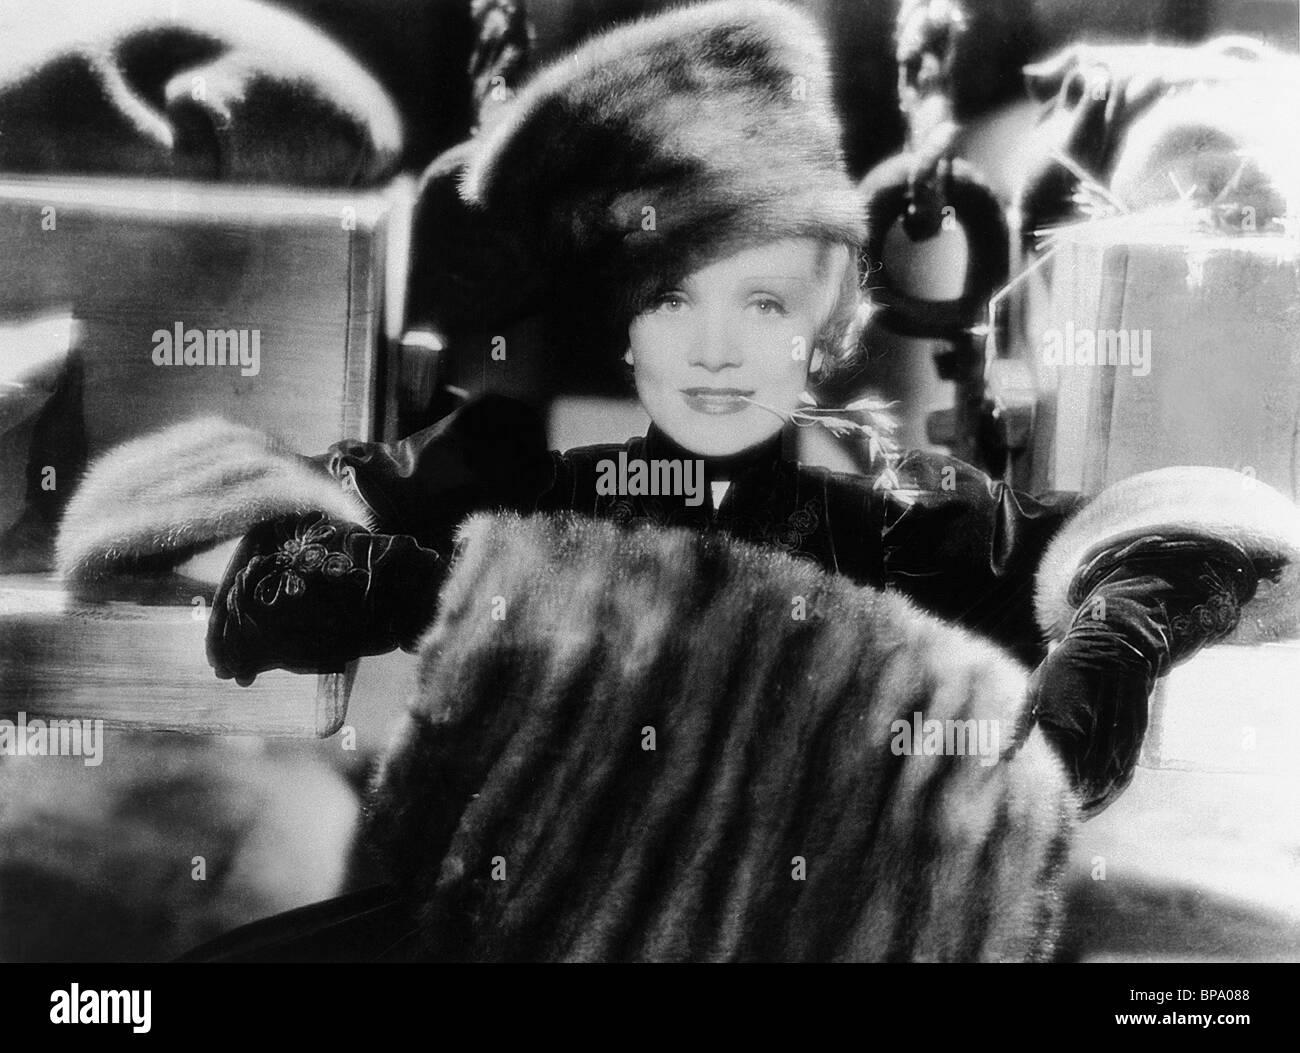 MARLENE DIETRICH THE SCARLET EMPRESS (1934) - Stock Image